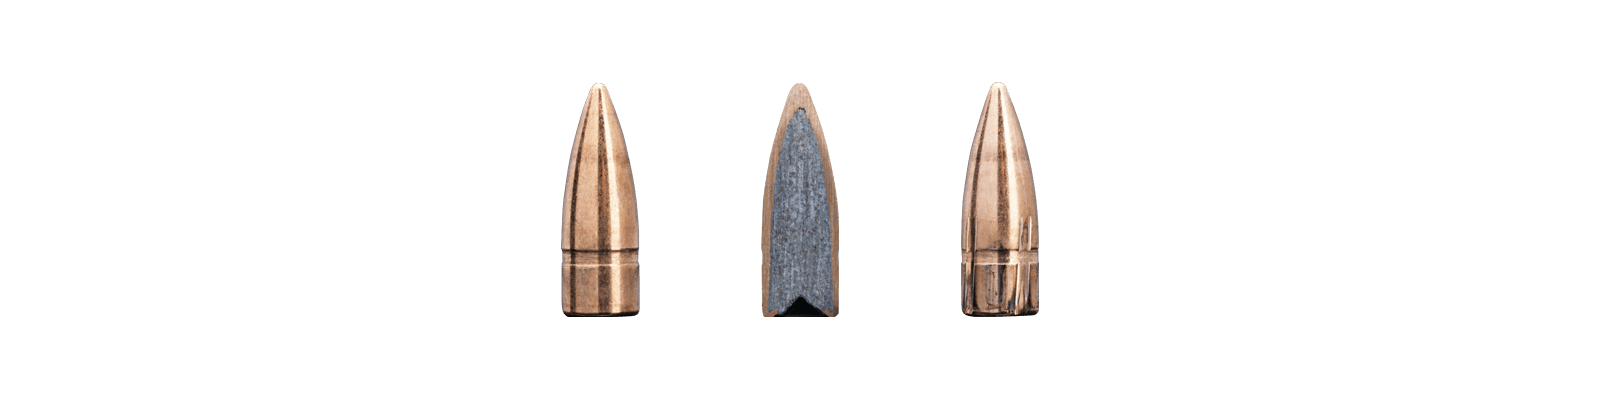 Sako 22-250 Rem Speedhead 3,2g (105G) 20 kpl / ras